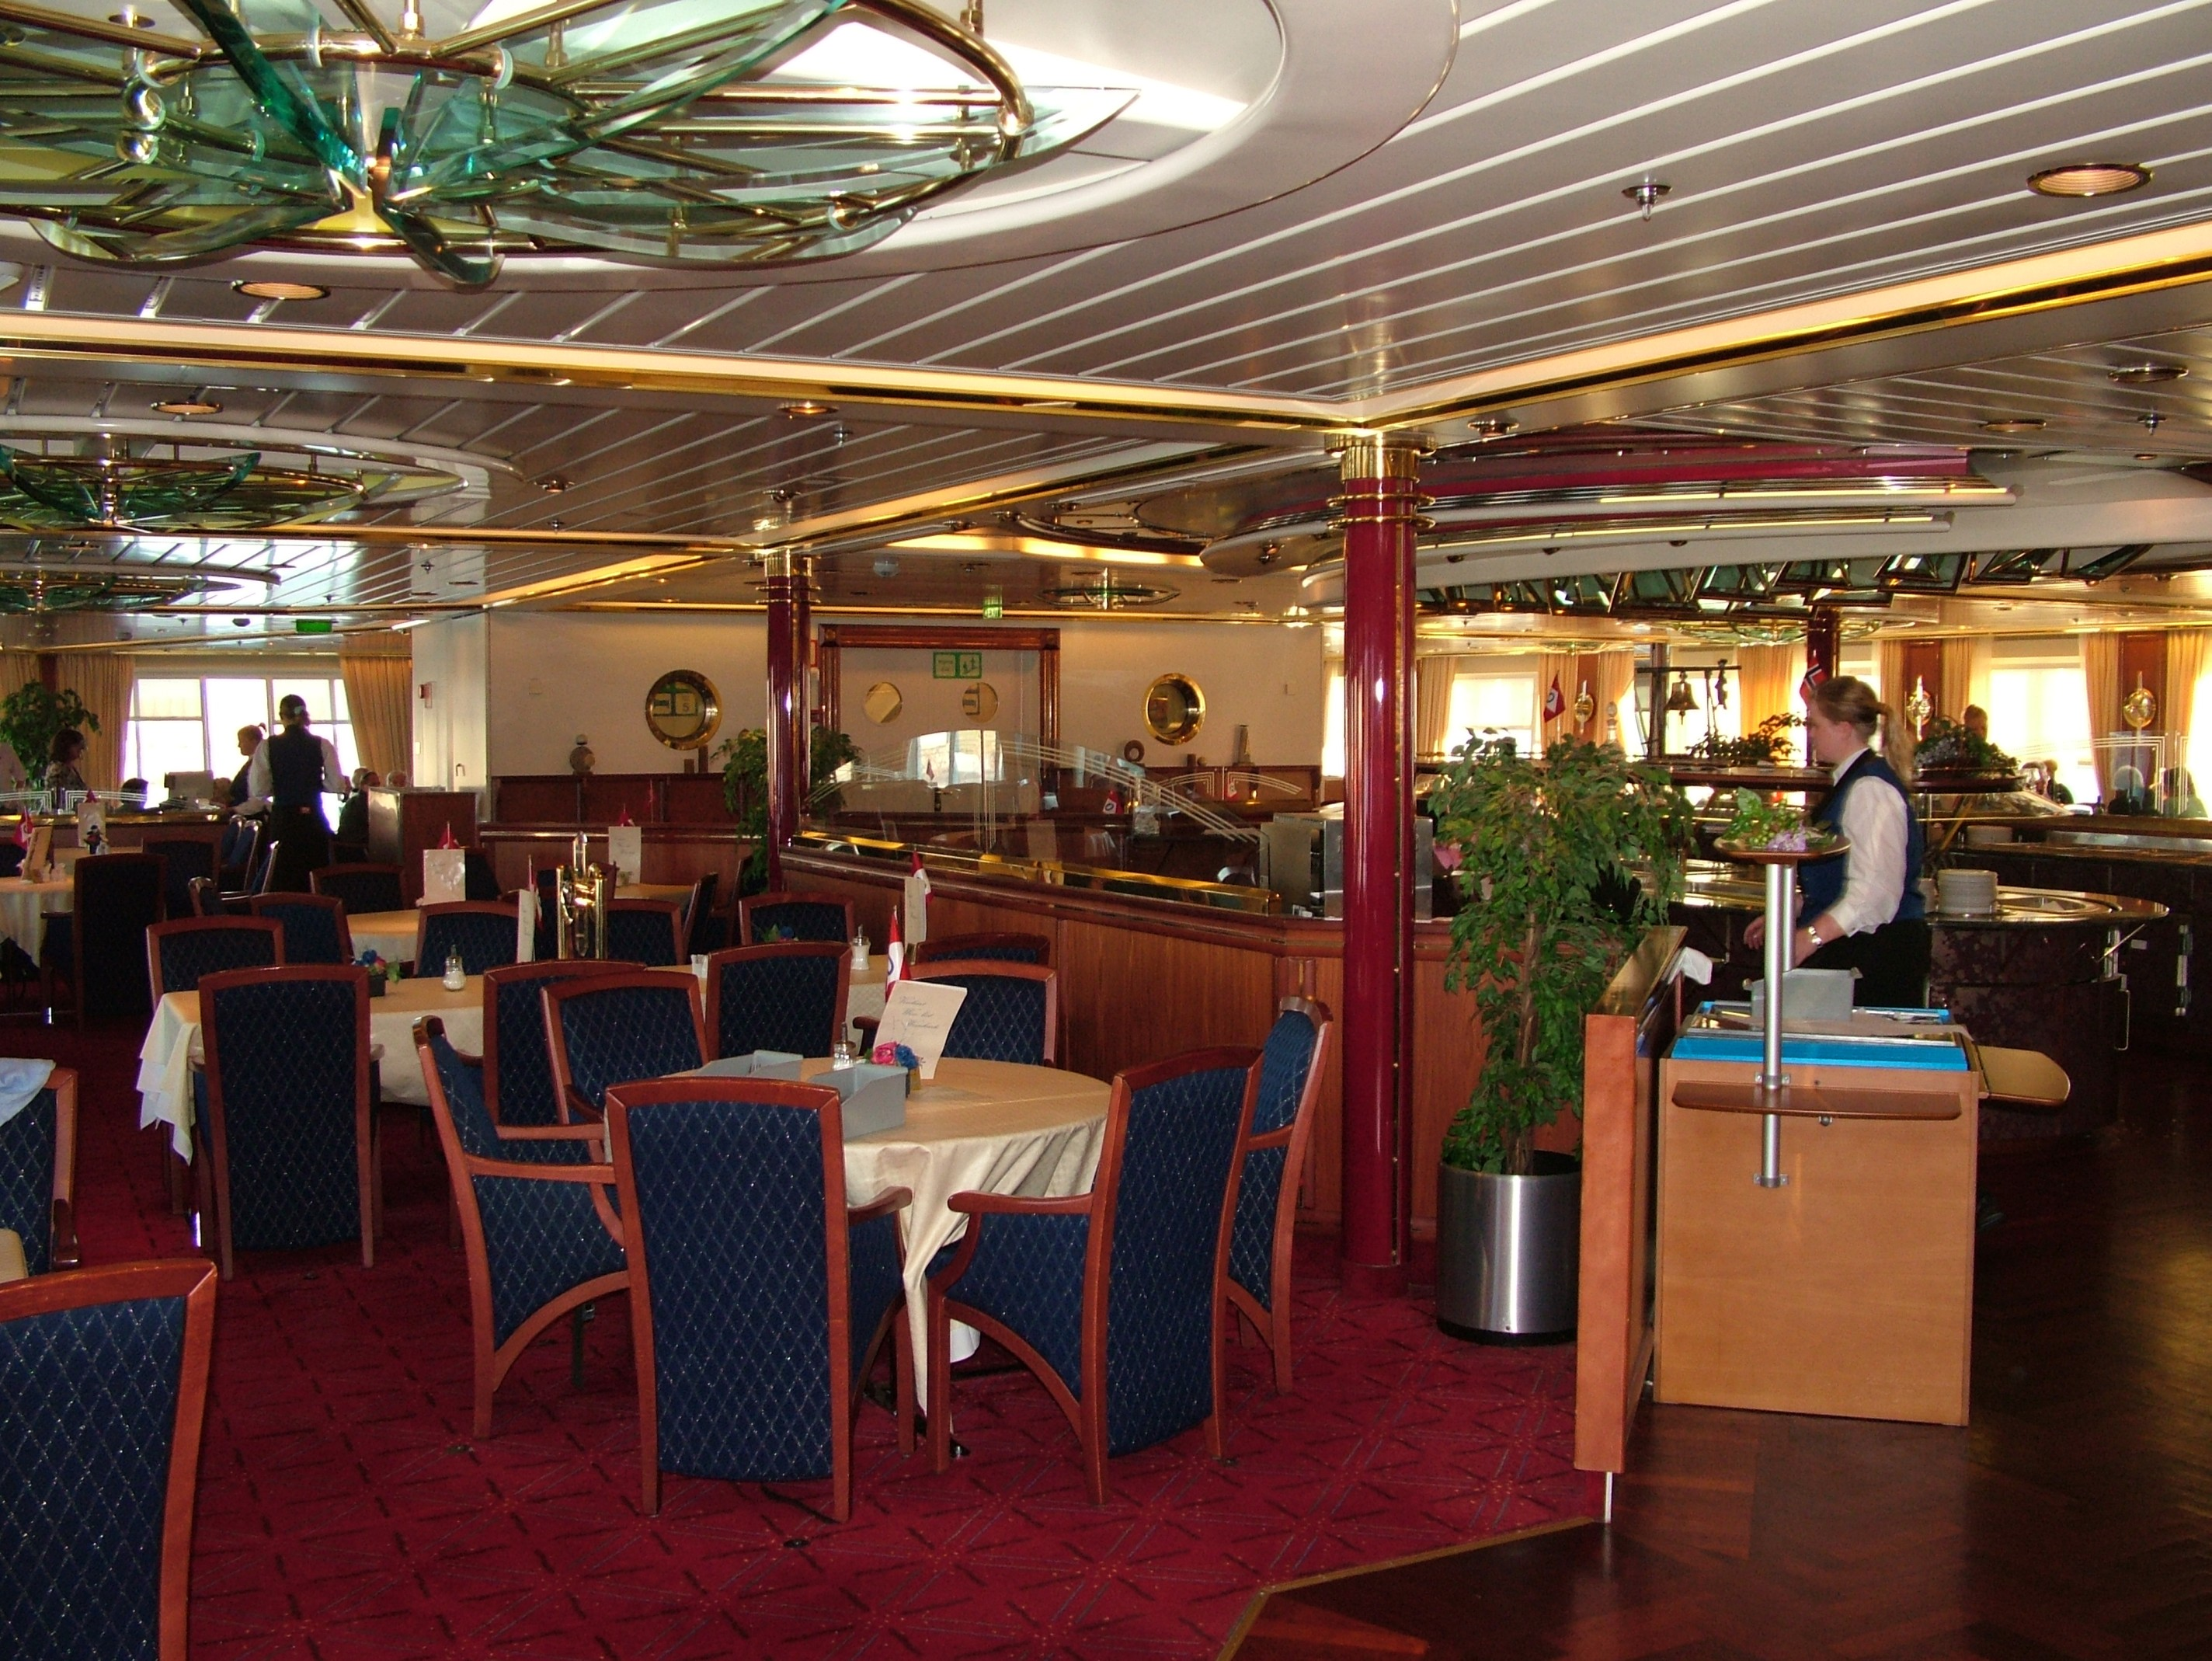 File:MS Nordnorge Restaurant.jpg - Wikimedia Commons